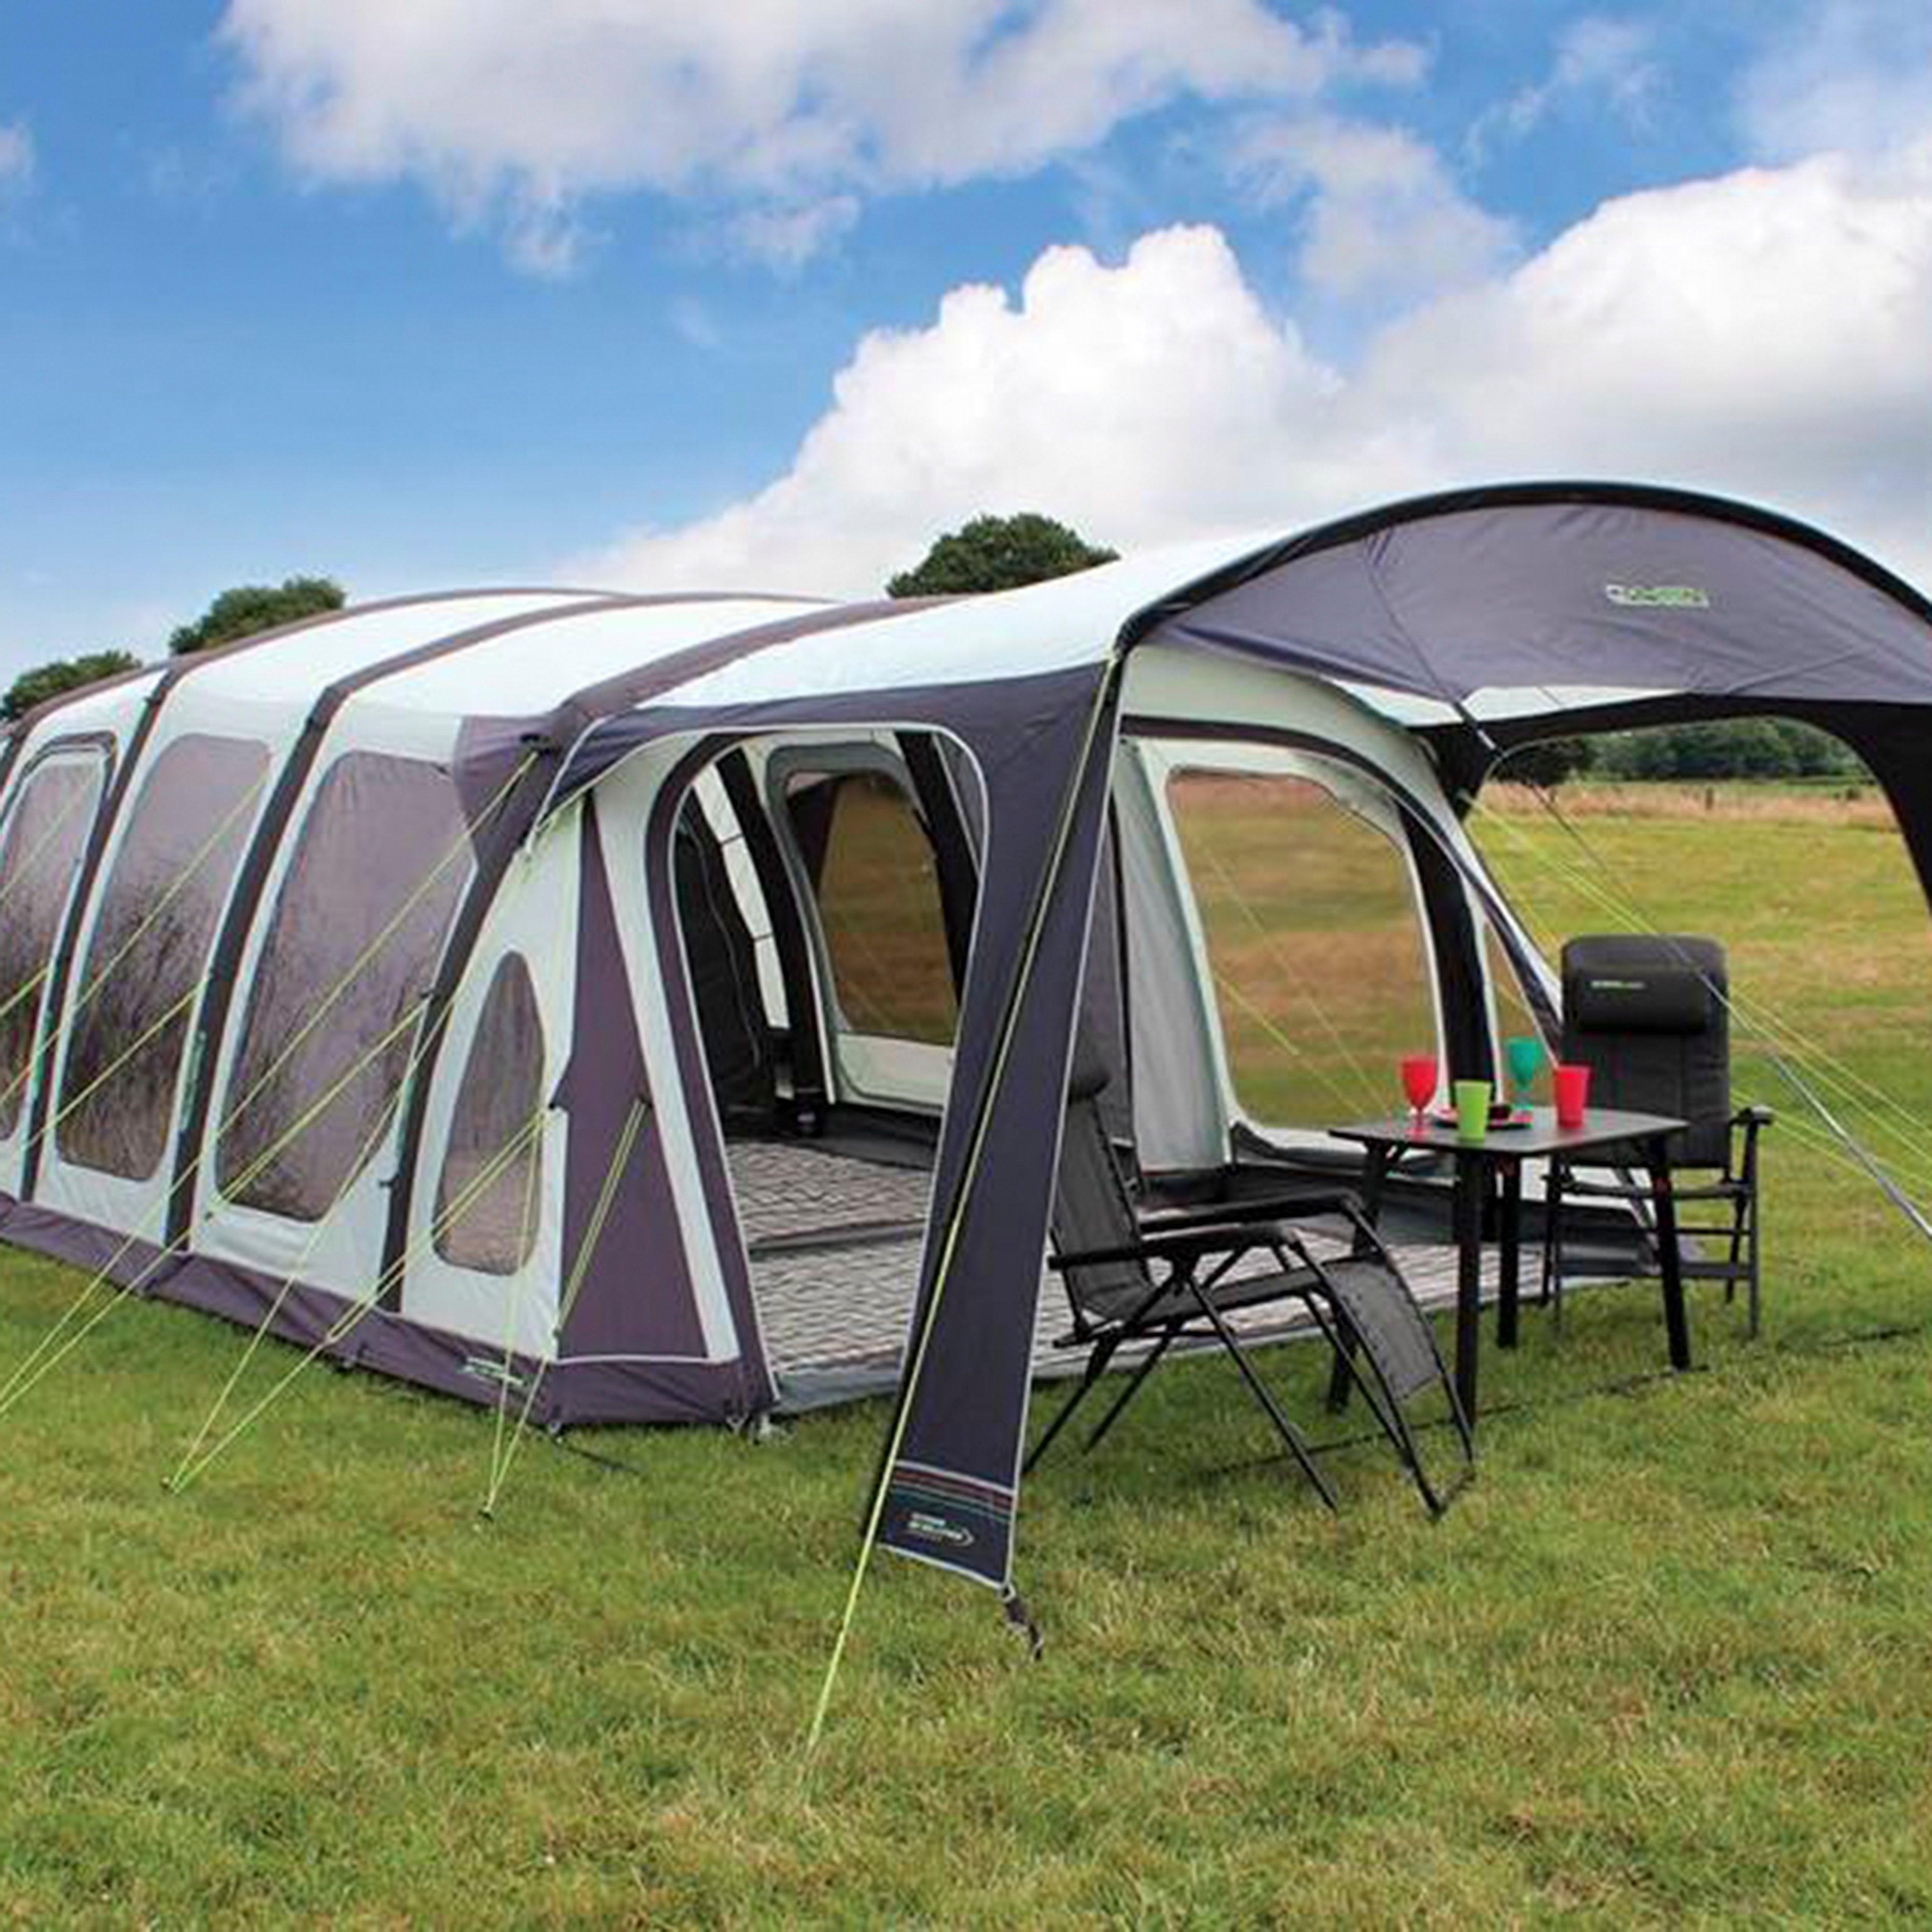 Outdoor Revolution Oxygen Ozone 6.0 XTR Tent